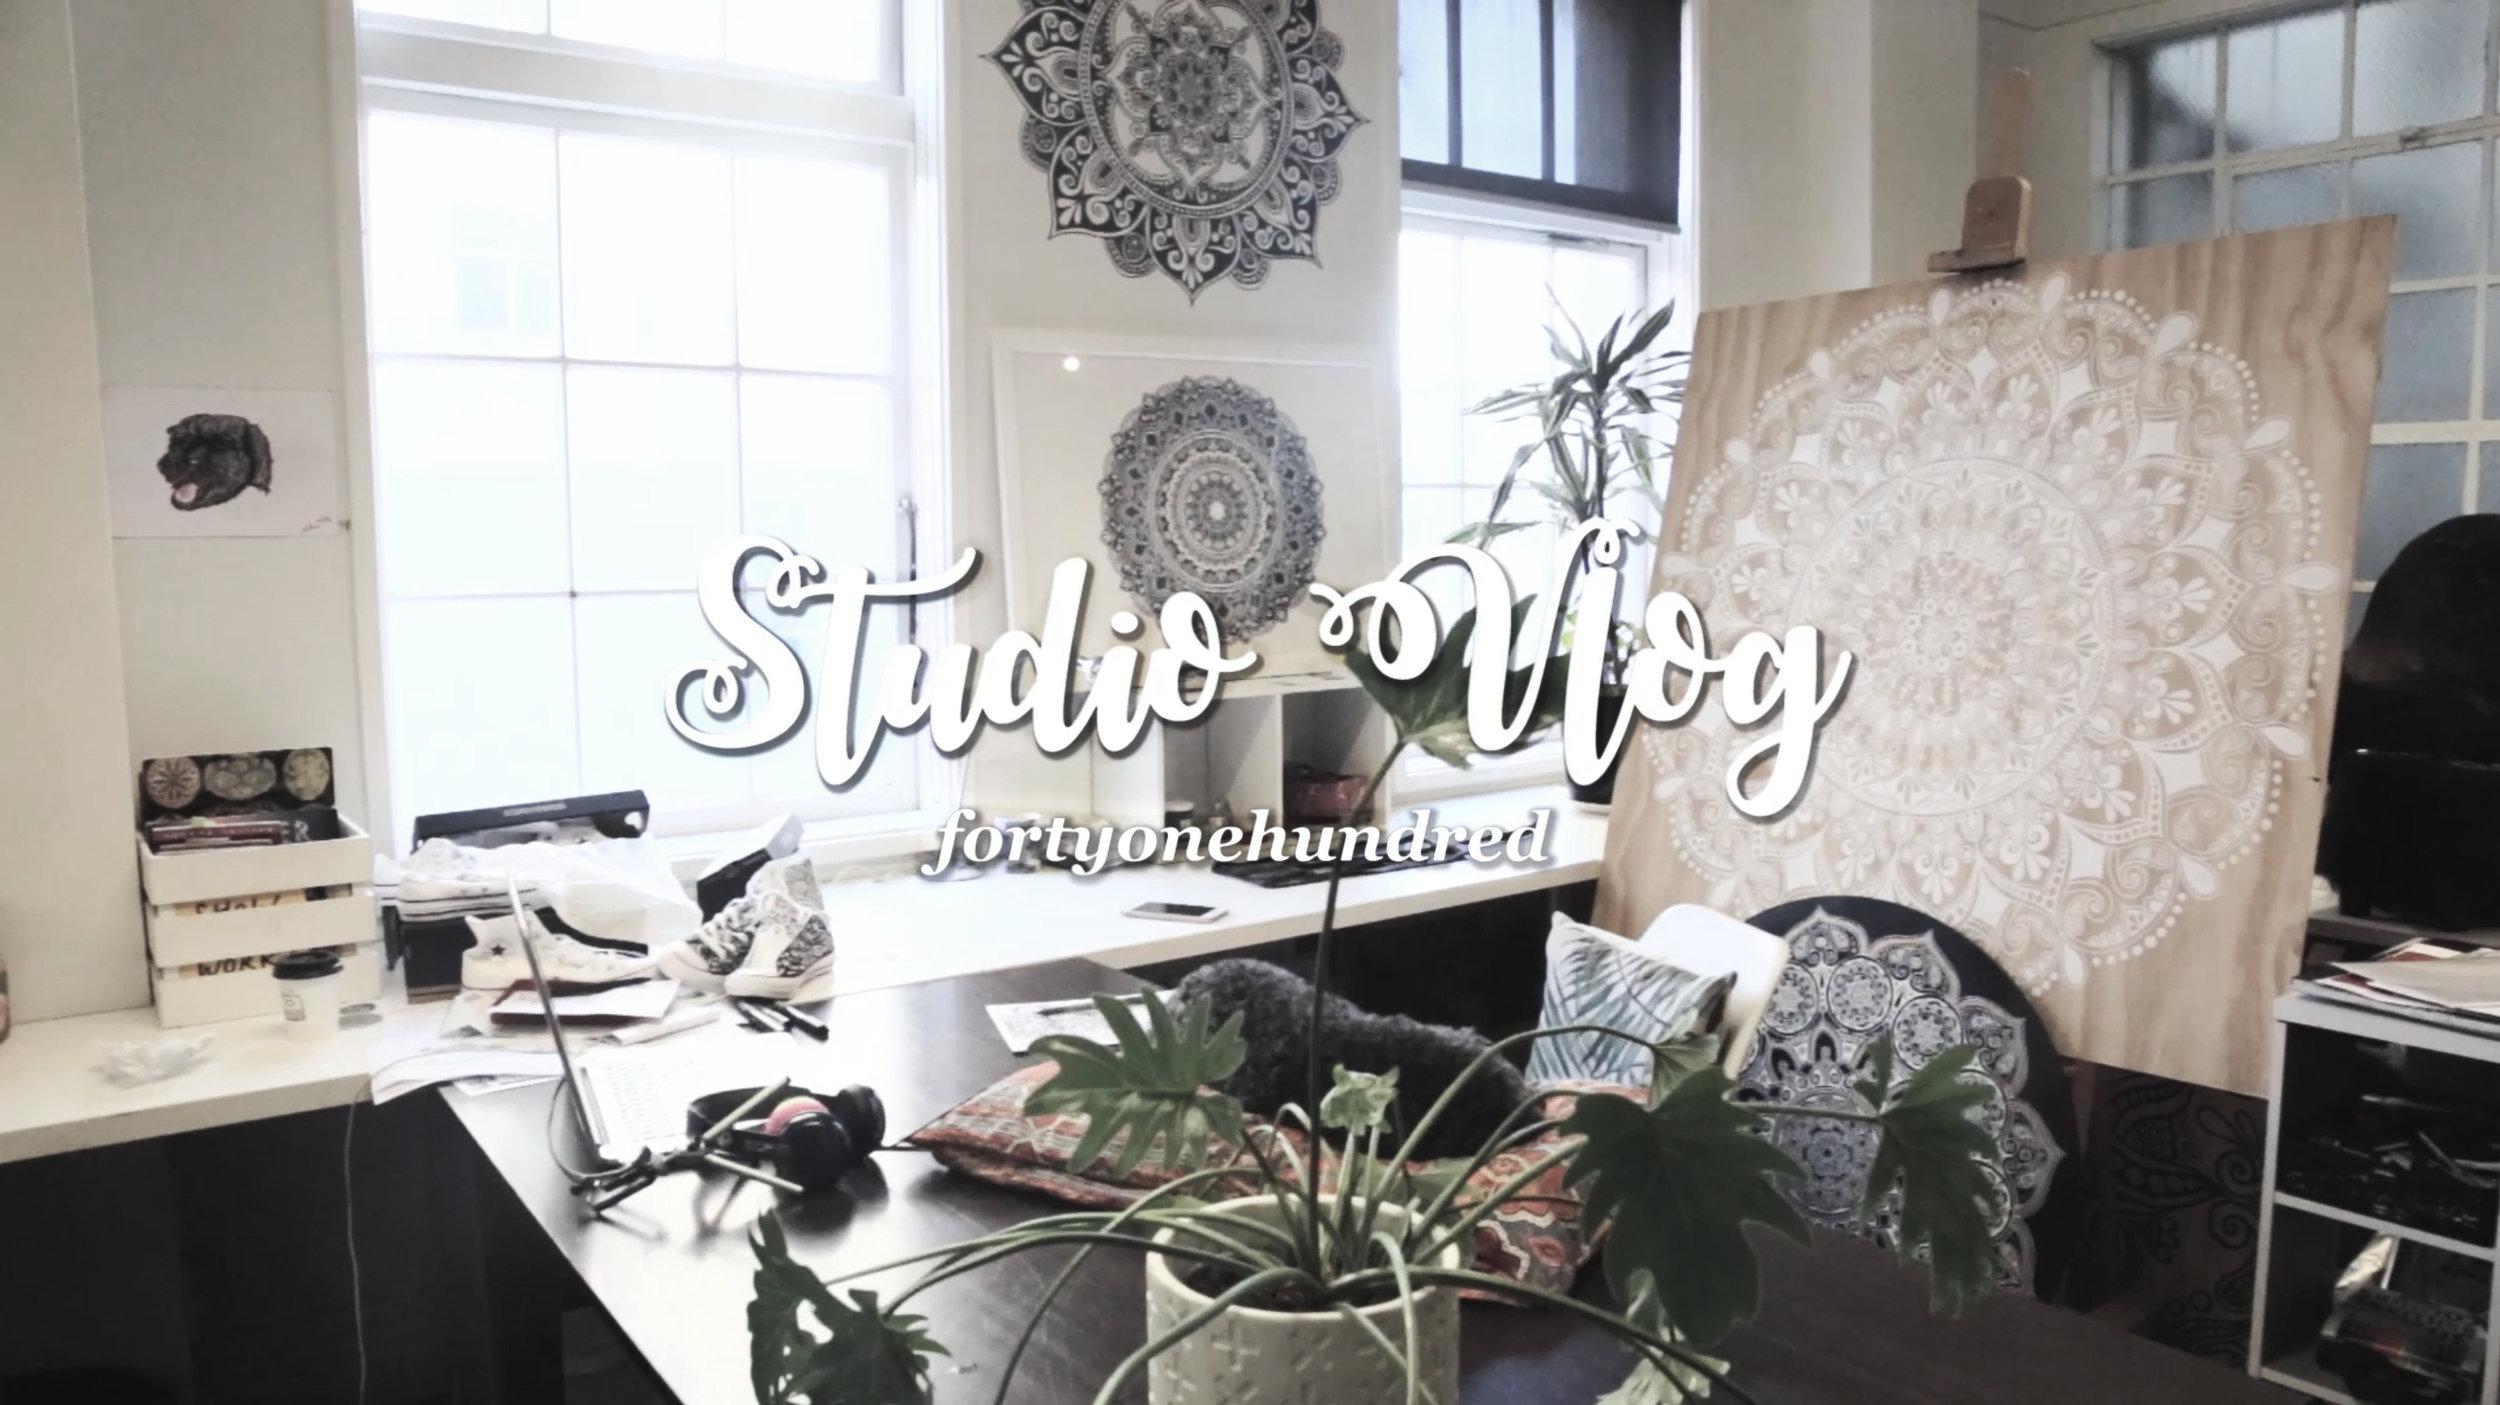 Studio tour video